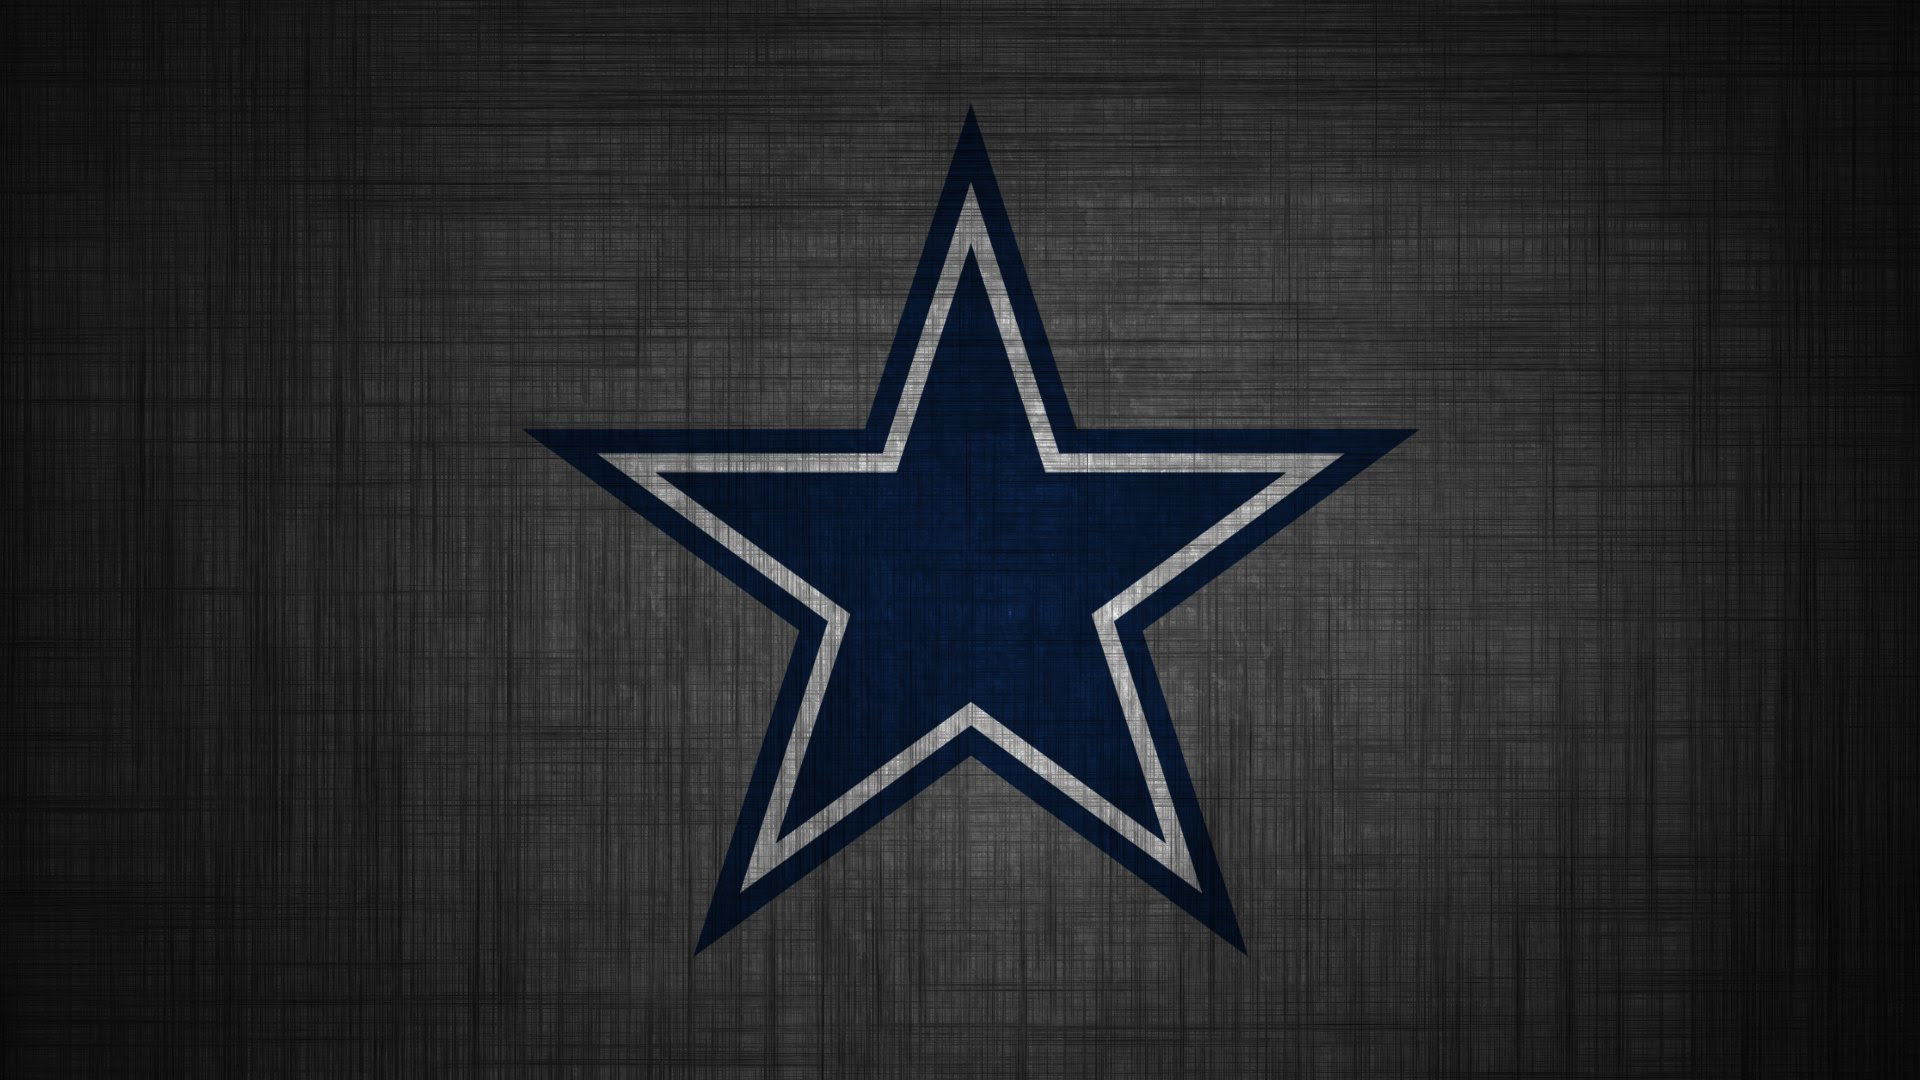 Dallas Cowboys Wallpapers Free Download   PixelsTalk.Net